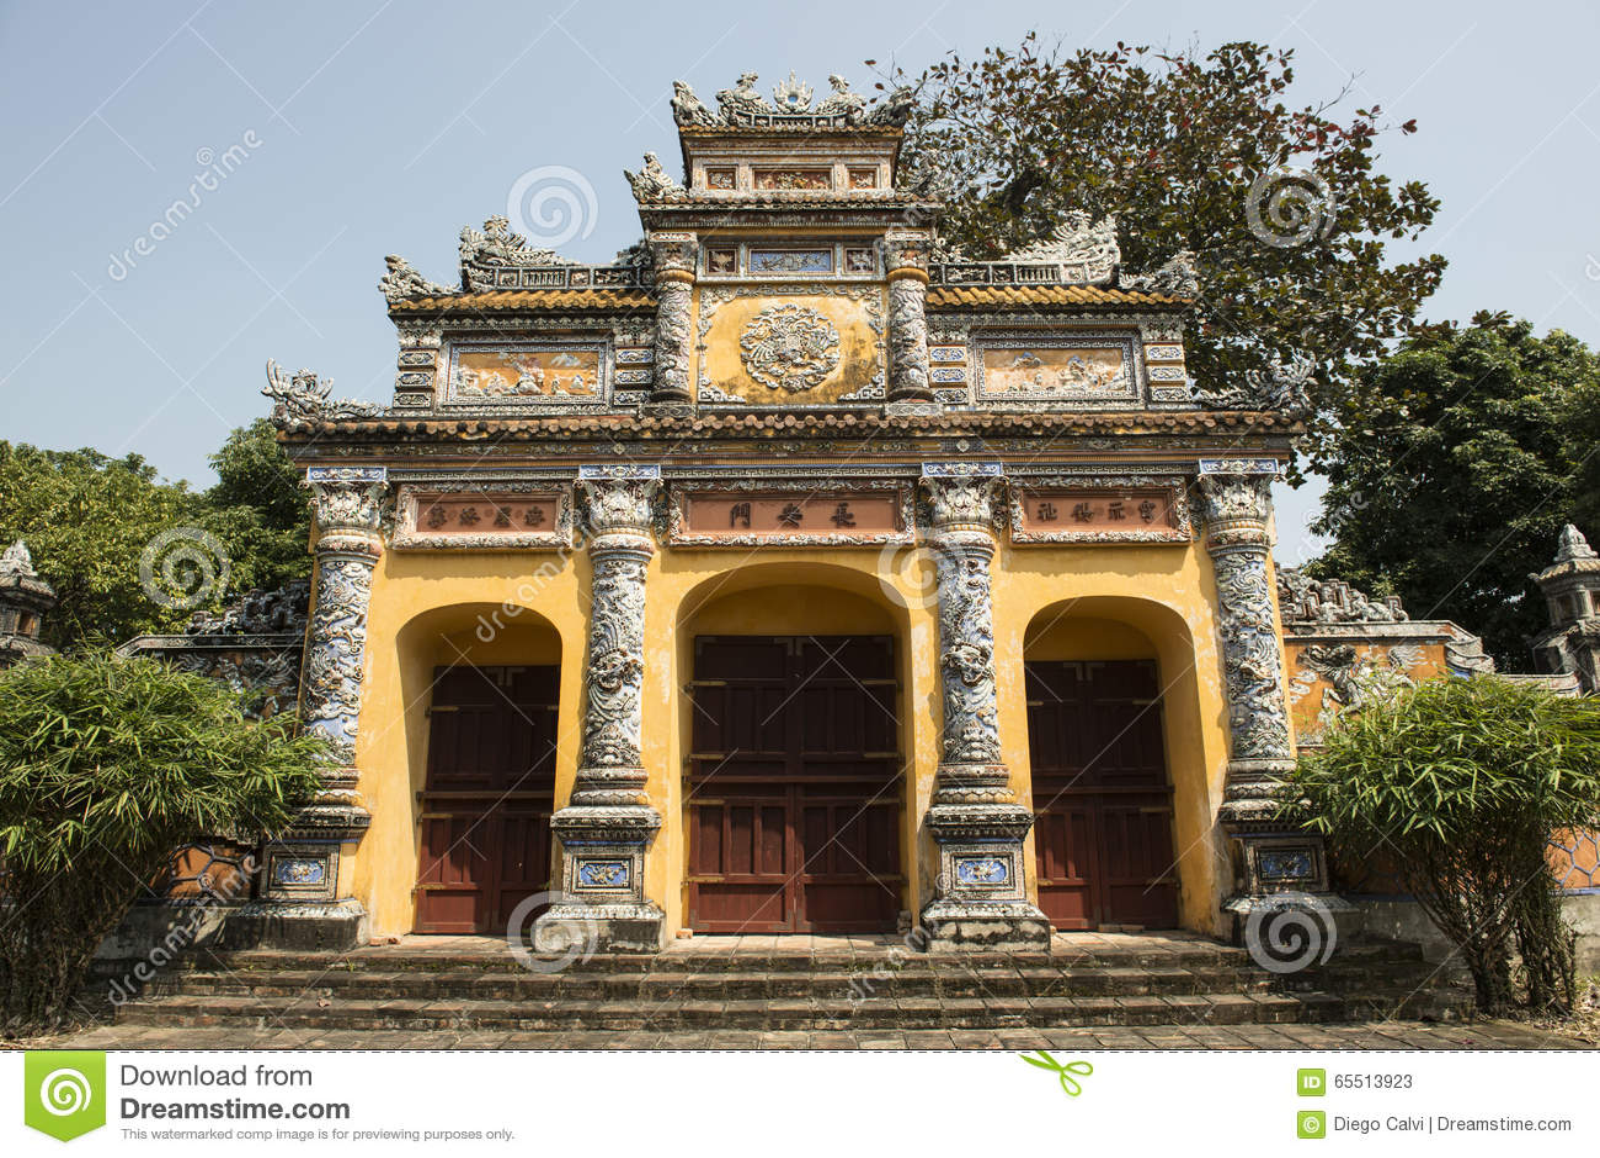 Gateway in the Forbidden Purple City in Hue, Vietnam.